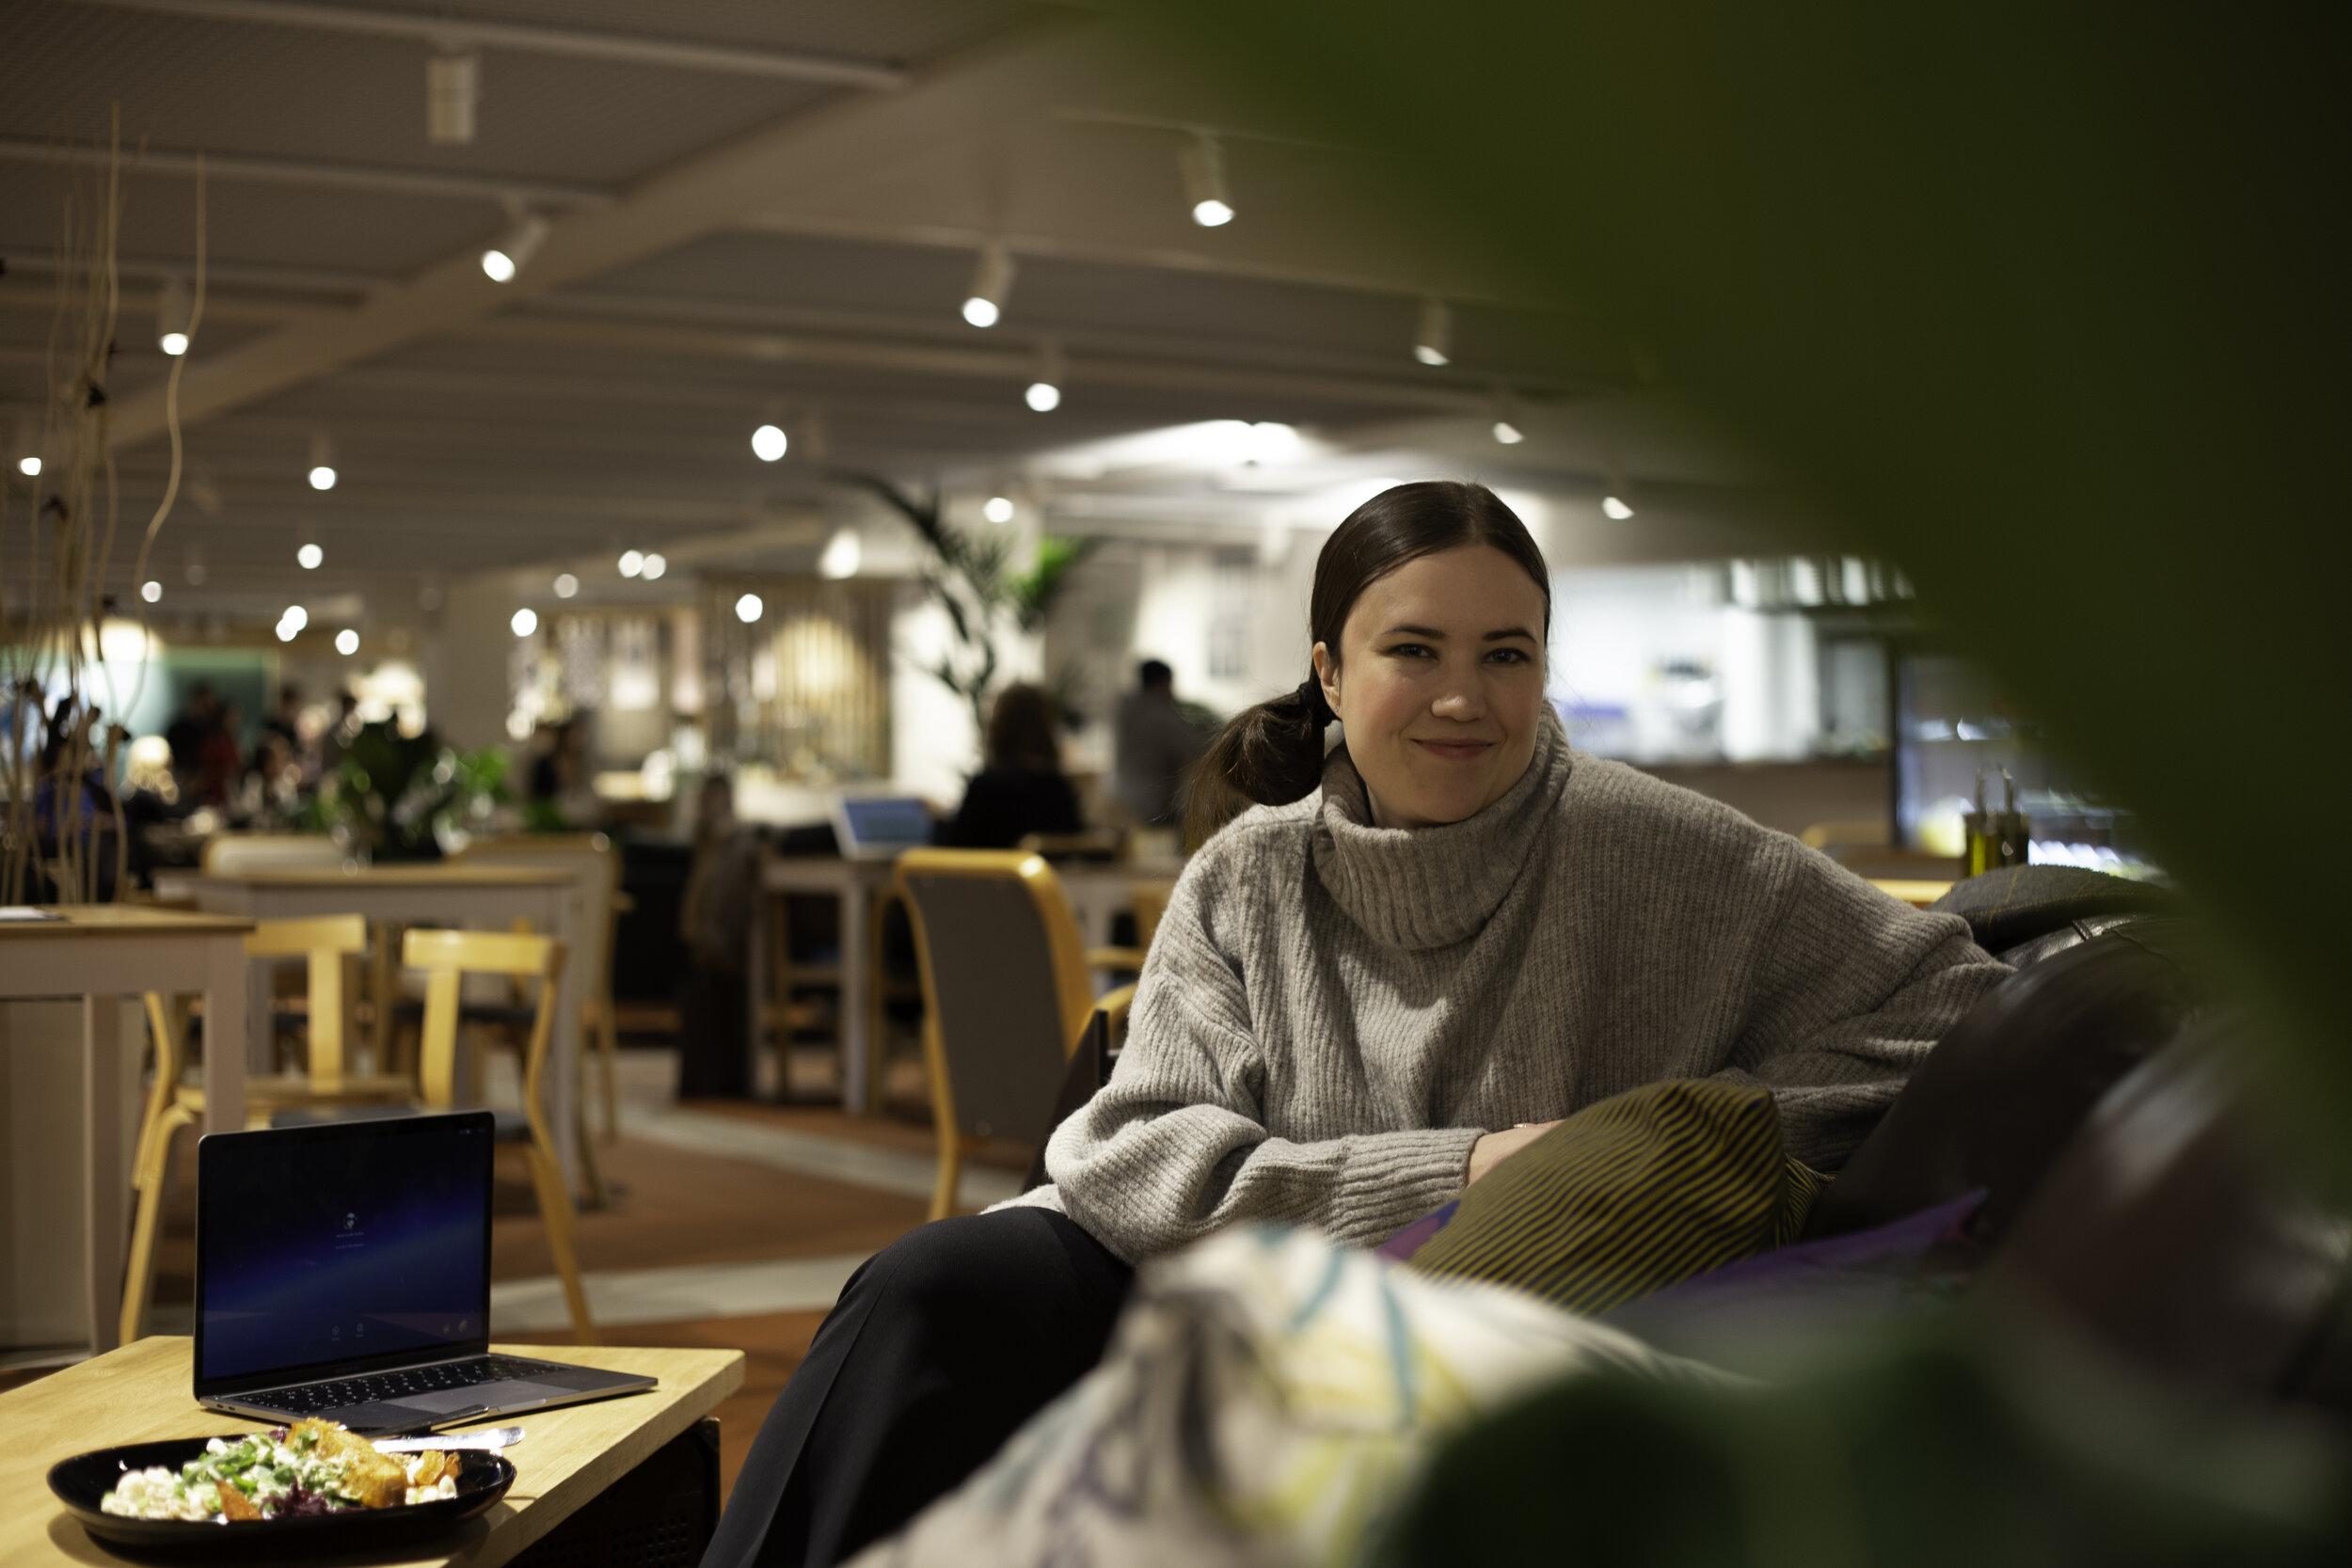 Prönö founder Helene Auramo sitting in a cfe